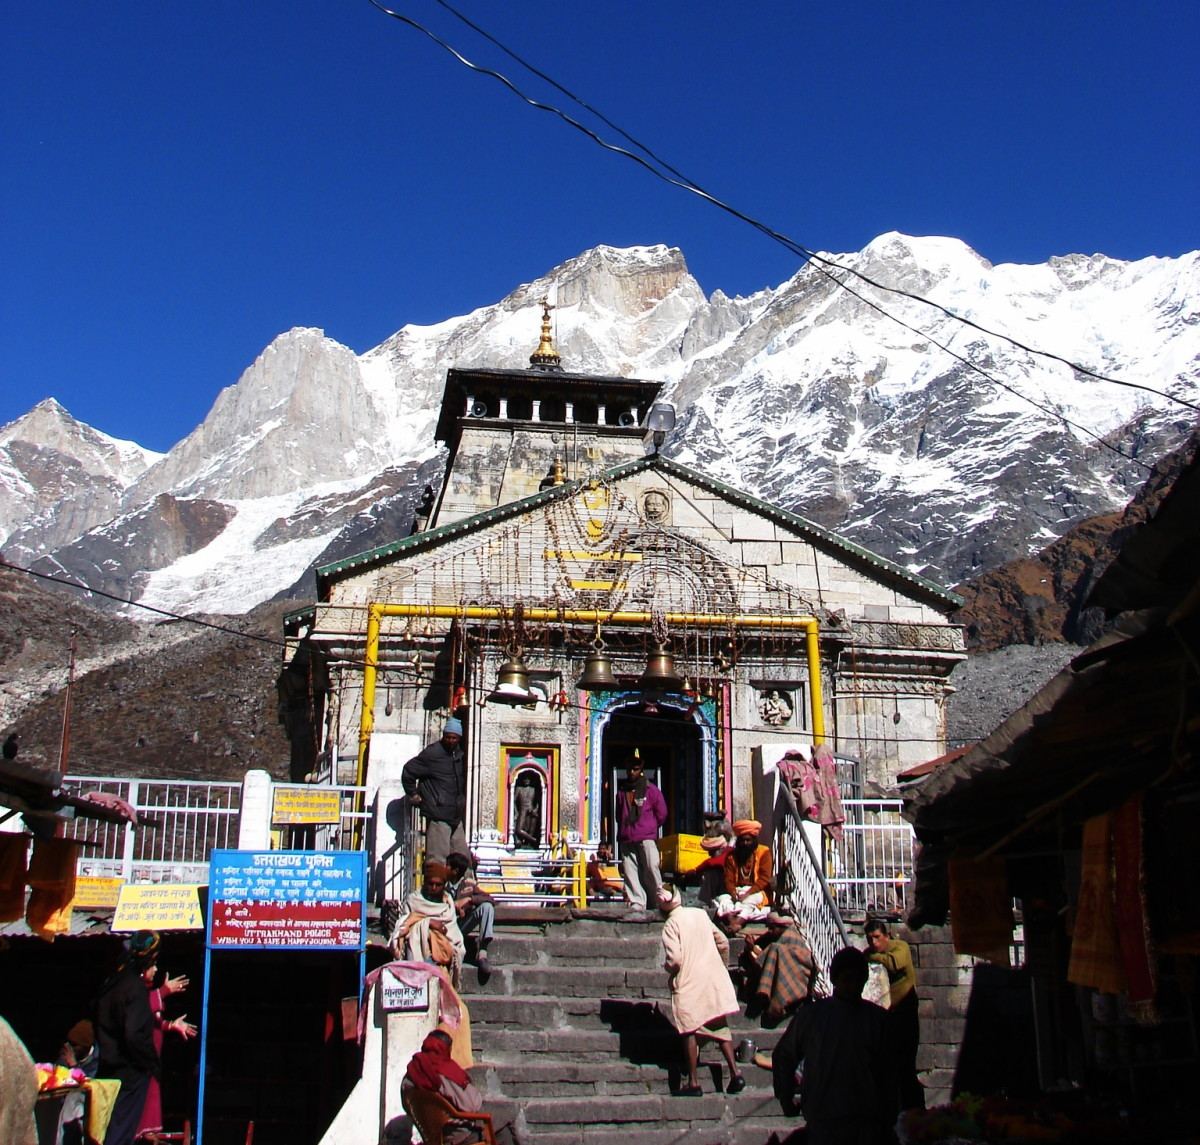 Kedarnath -- 30.7352 degrees North, 79.0669 degrees East